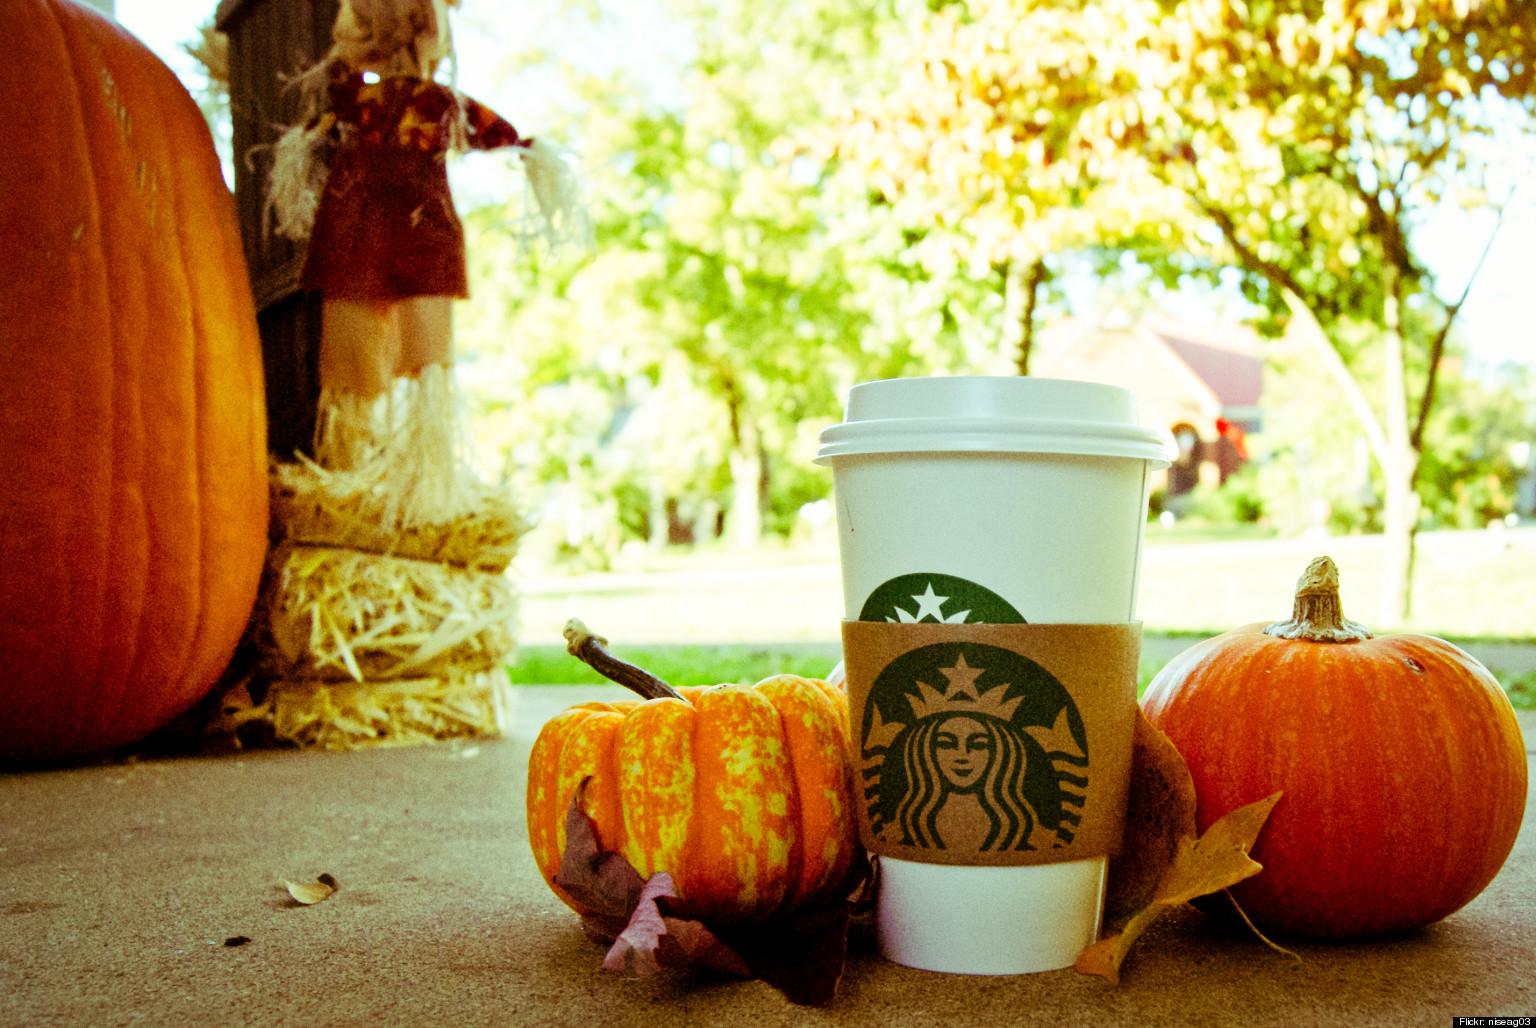 Fall Pumpkin Iphone Wallpaper Pumpkin Spice Latte Shortage Starbucks Annual Autumn